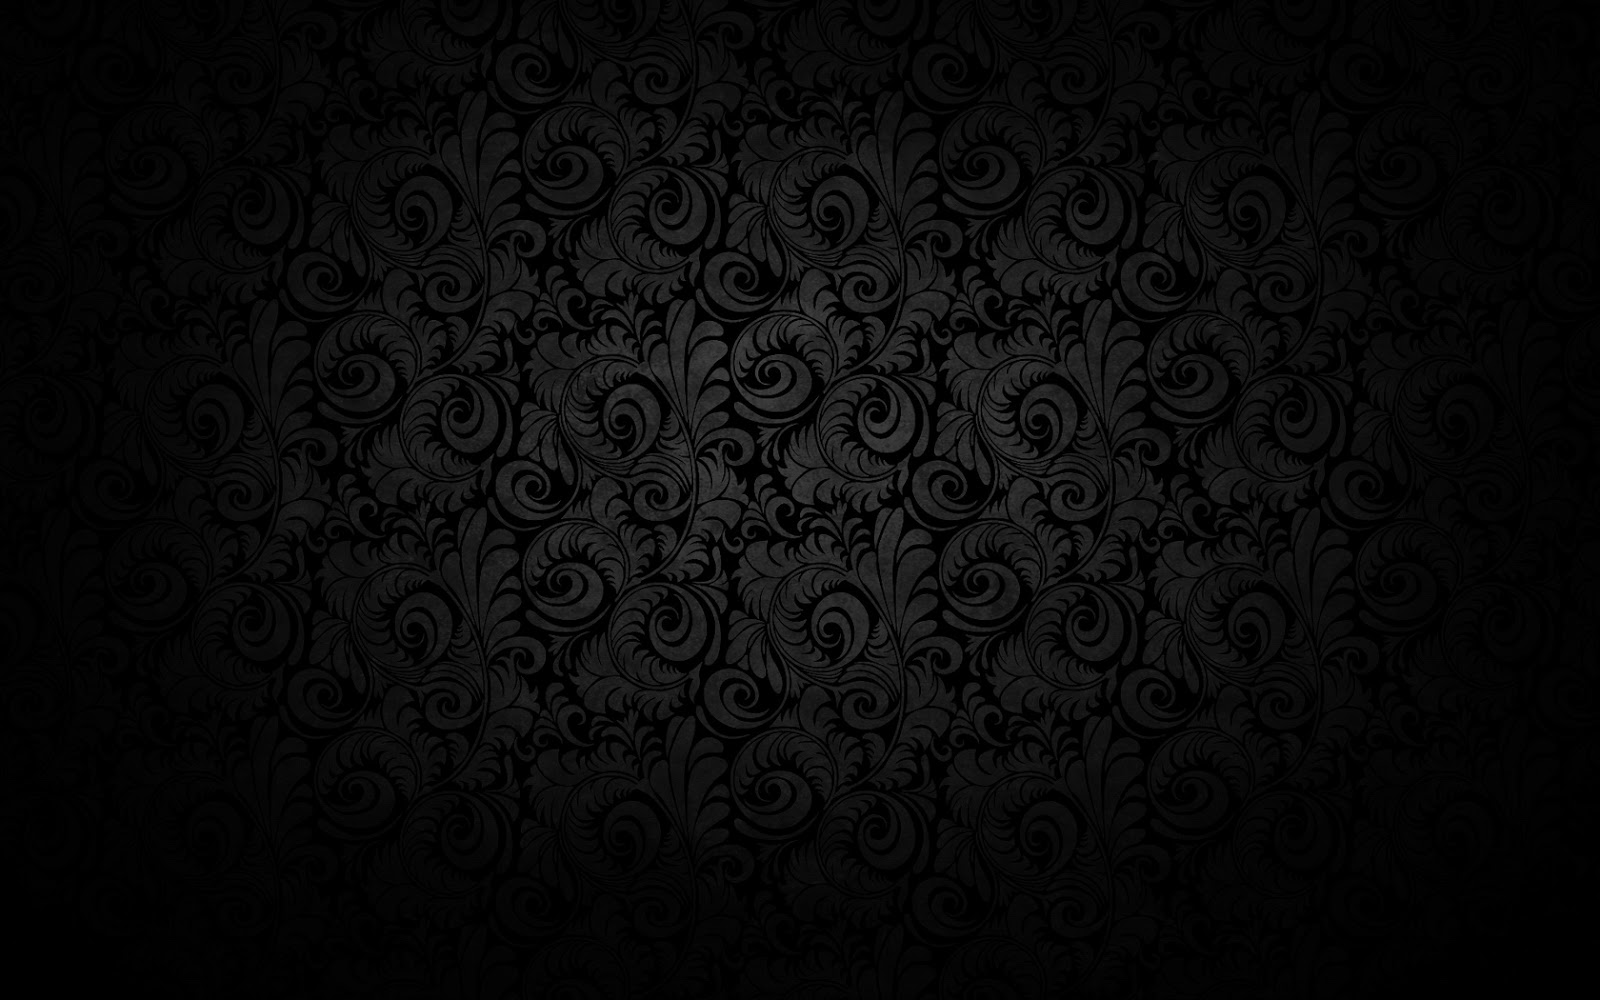 Most Inspiring Wallpaper Home Screen Classy - black-wallpaper-hd-hd-wallpapers  2018_19657.jpg